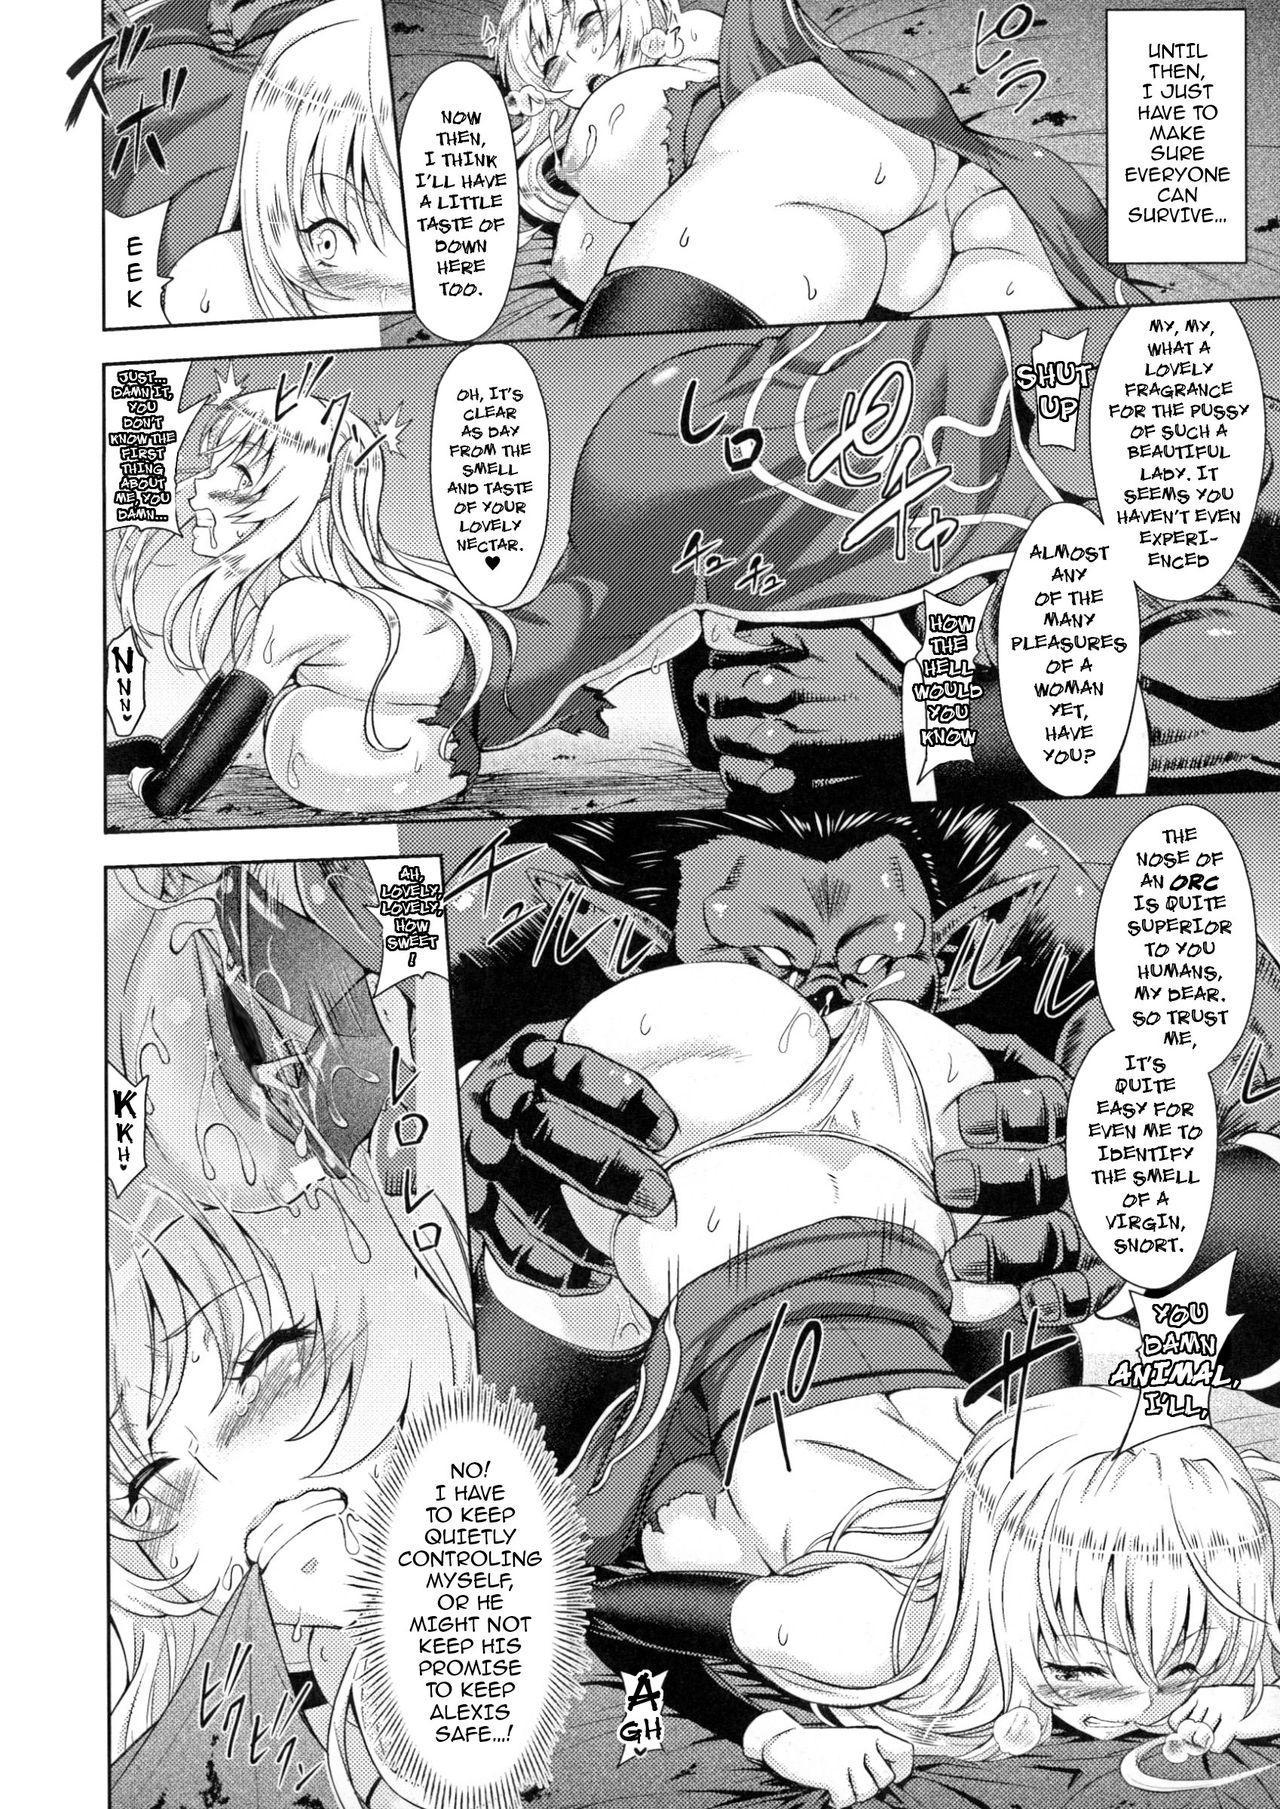 [Yamada Gogogo] Erona ~Orc no Inmon ni Okasareta Onna Kishi no Matsuro~ | Erona ~The Fall of a Beautiful Knight Cursed with the Lewd Mark of an Orc~ Ch. 1-6 [English] [darknight] [Decensored] [ongoing] 13